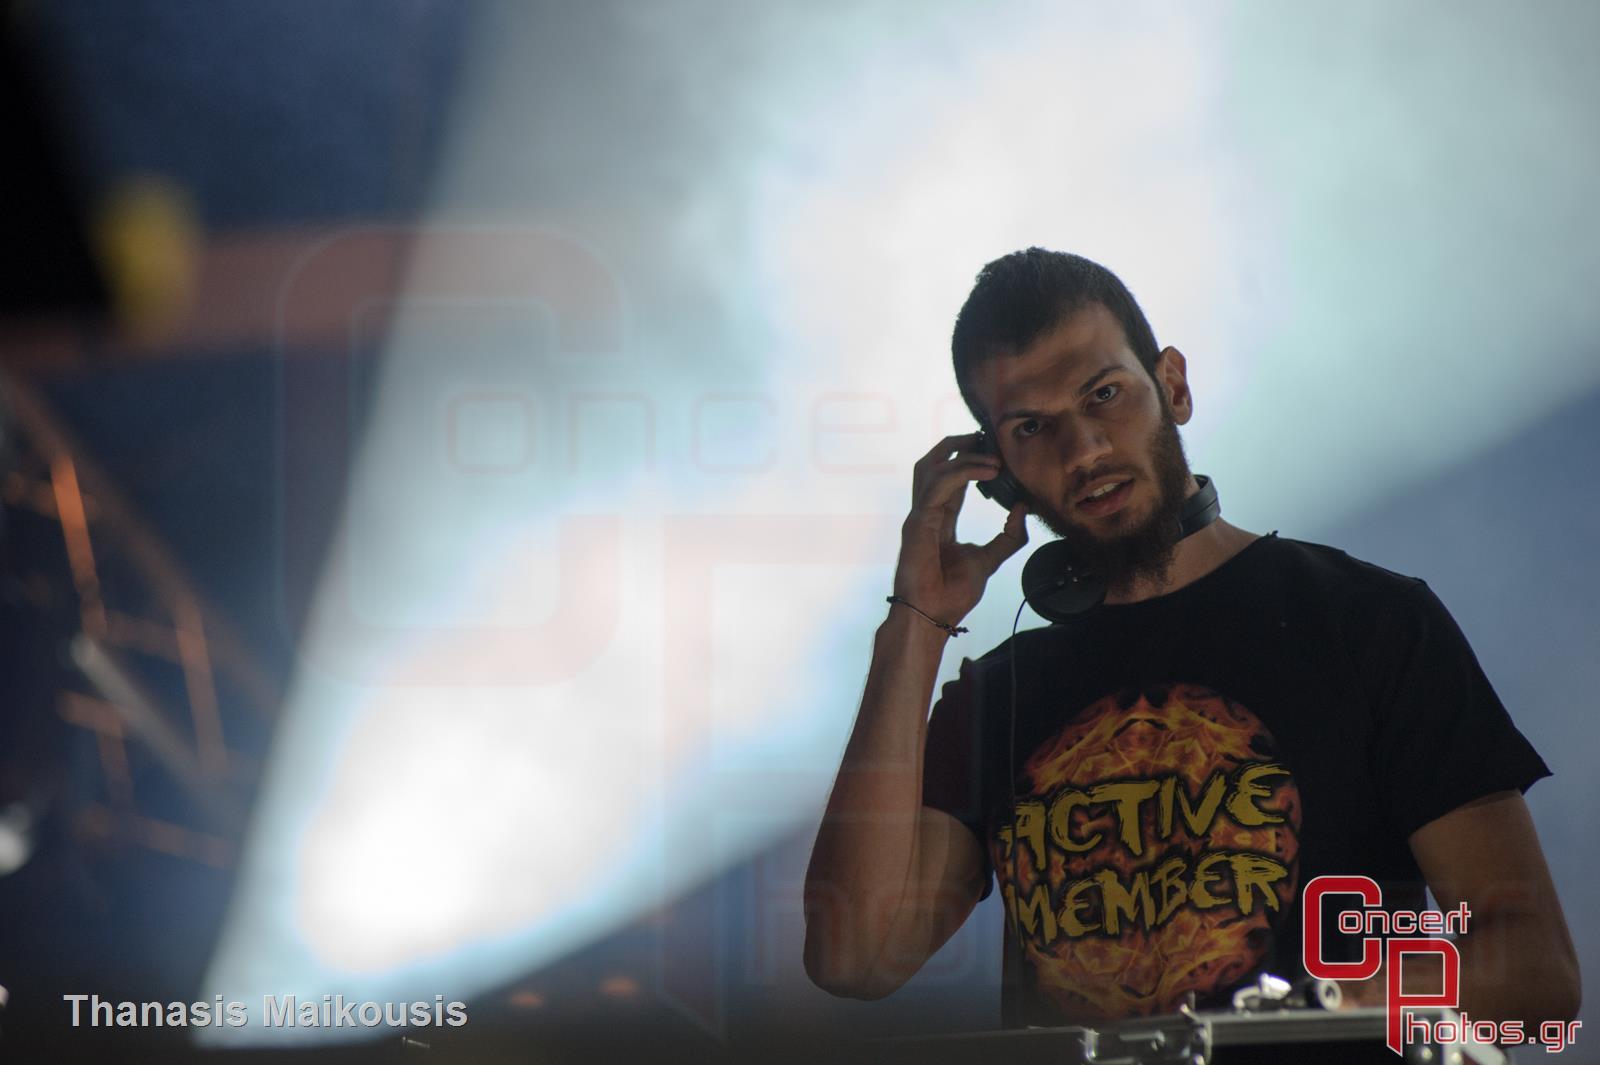 Active Member - Τραγούδα μας να φύγει το σκοτάδι- photographer: Thanasis Maikousis - concertphotos_-4873